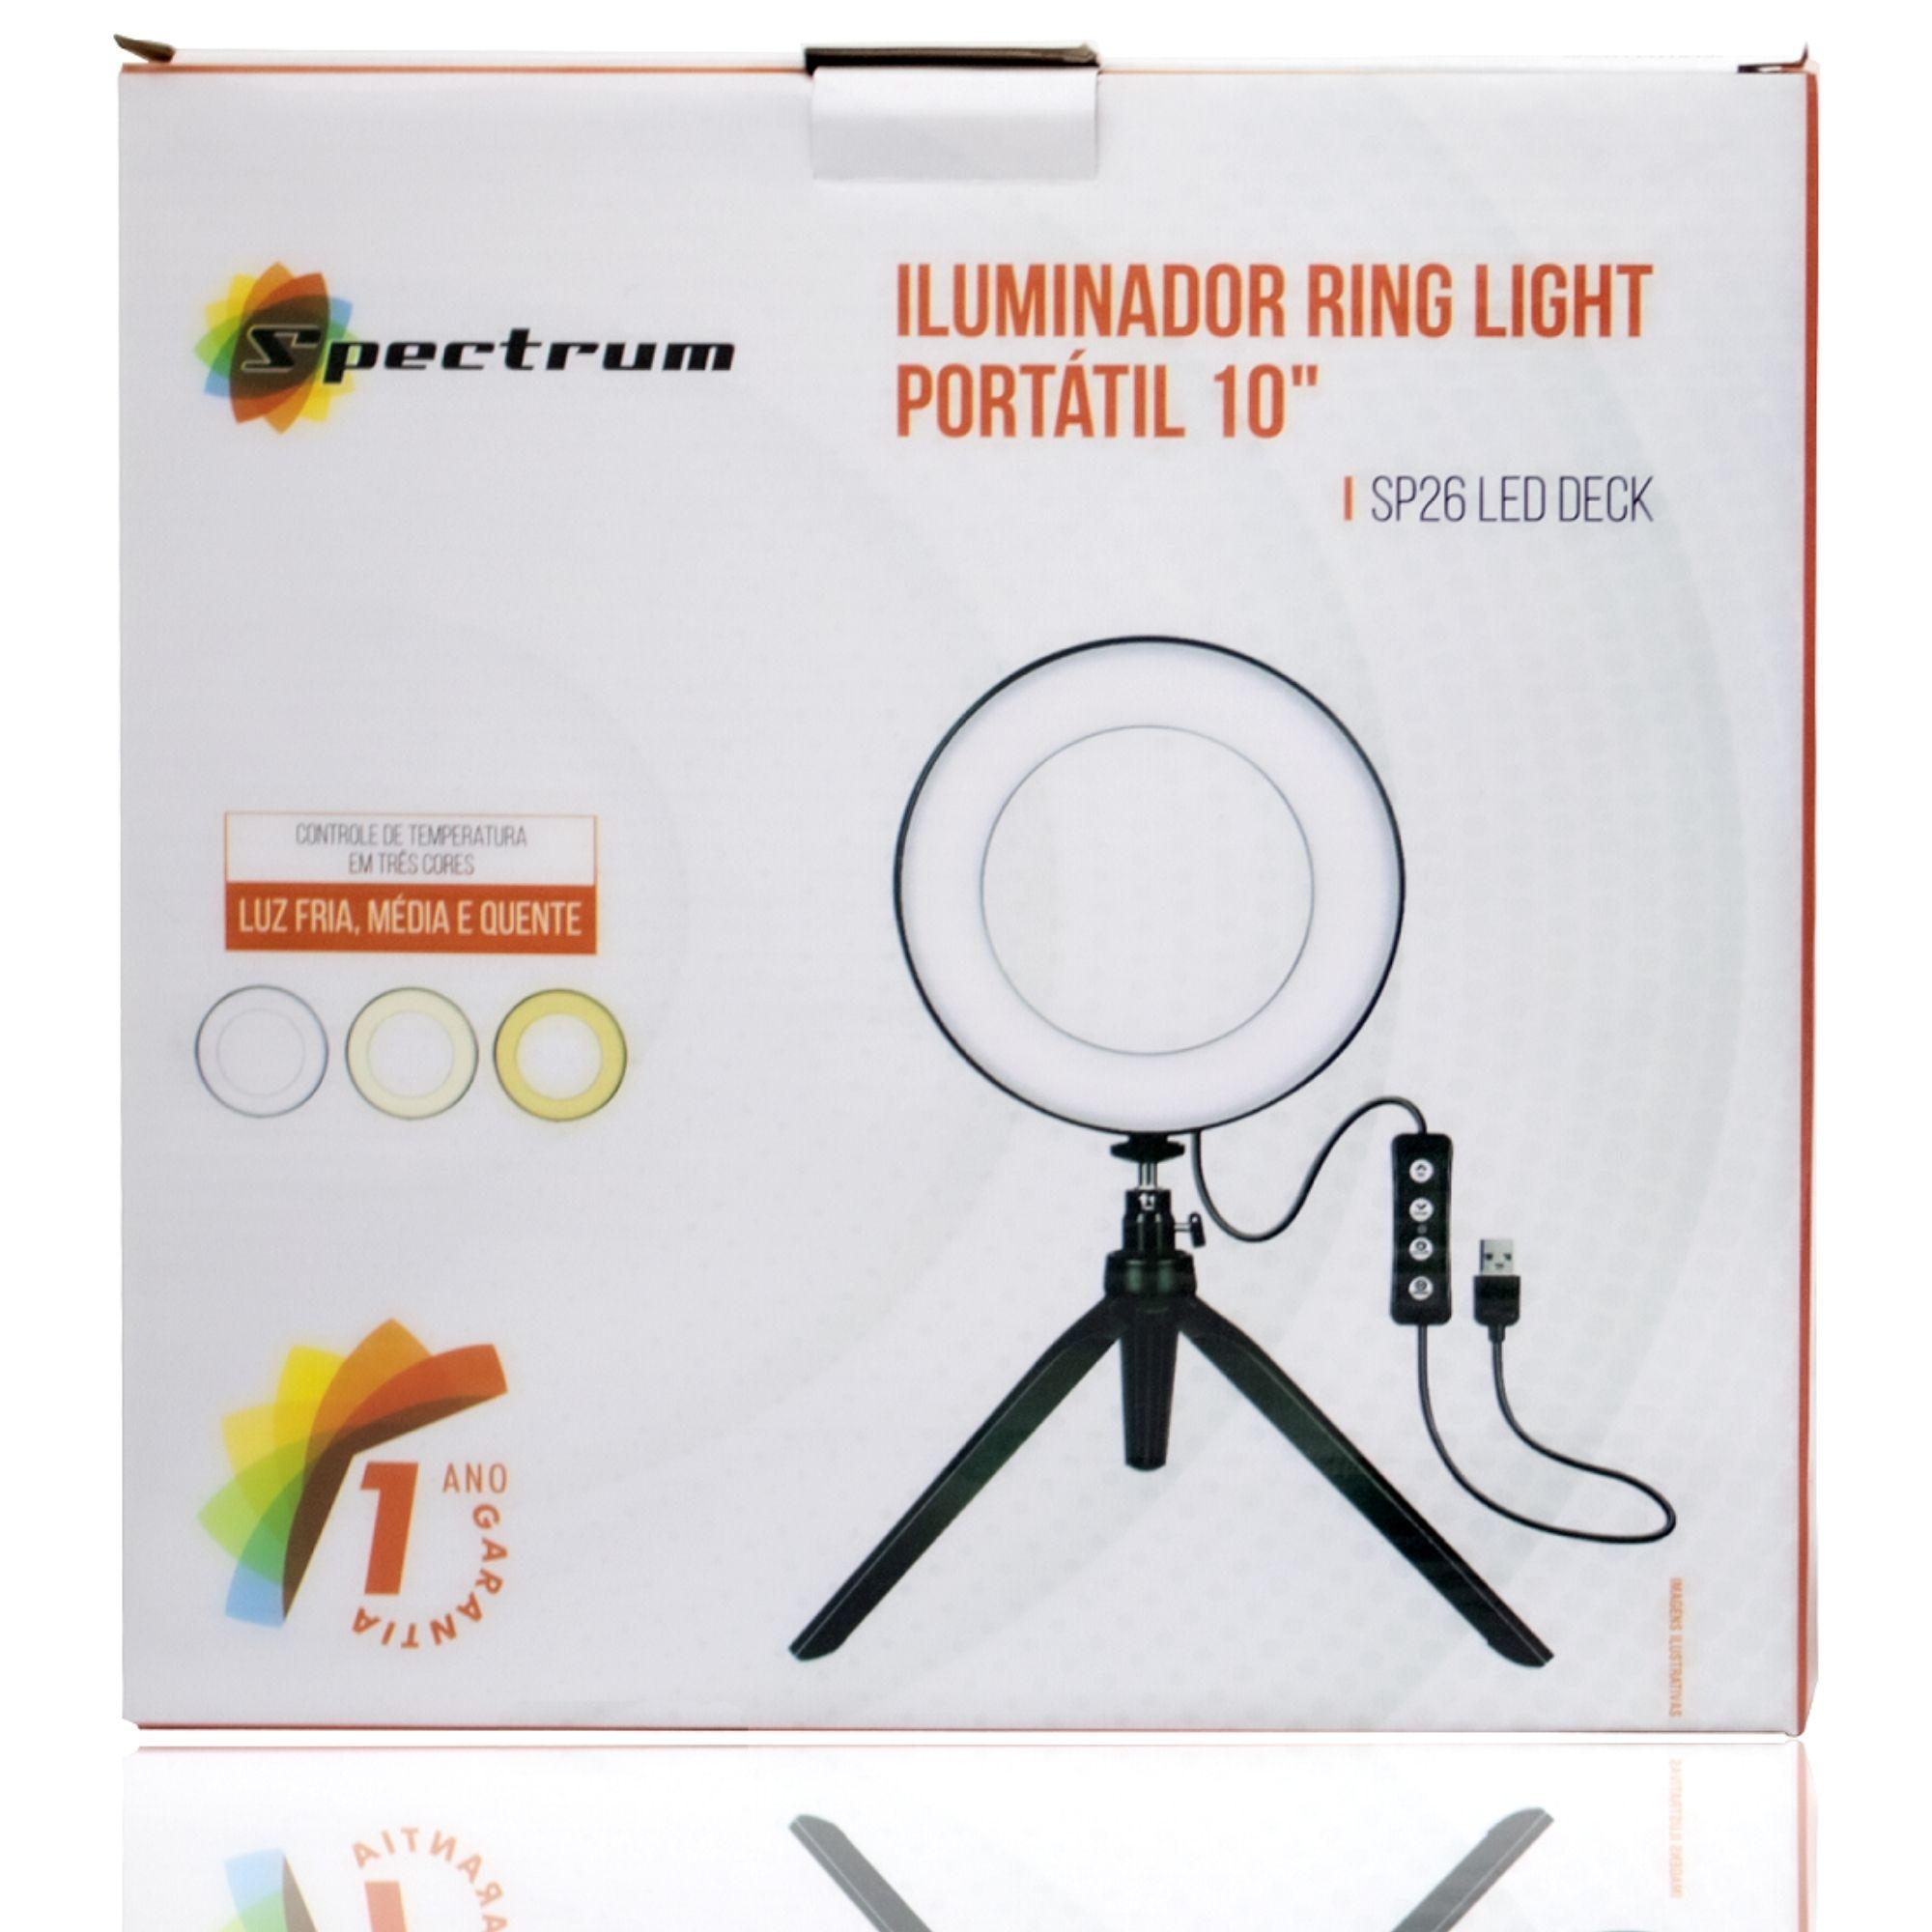 ILUMINADOR RING LIGHT SP-26 LED DECK, 26 CM, 10 POLEGADAS, MINI TRIPÉ DE MESA, SPECTRUM